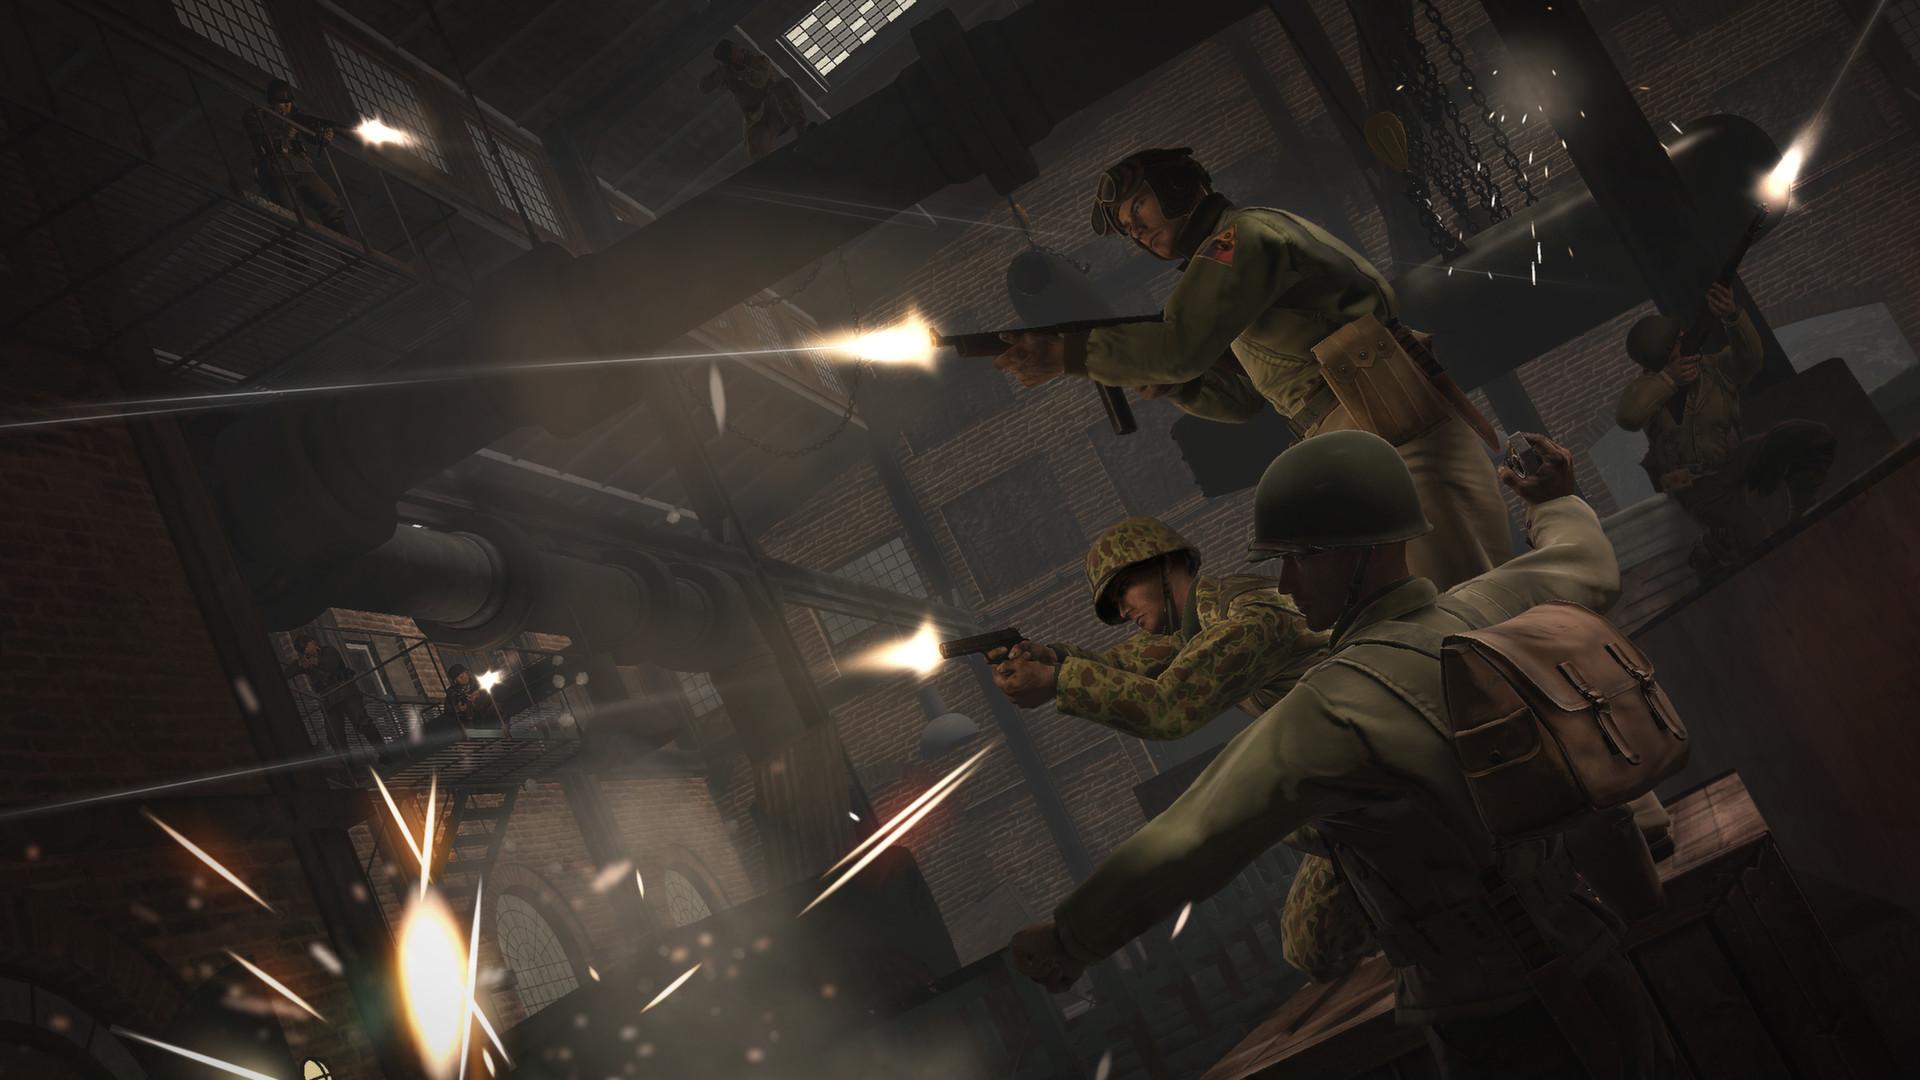 … Heroes & Generals (STEAM) PC Screenshot …